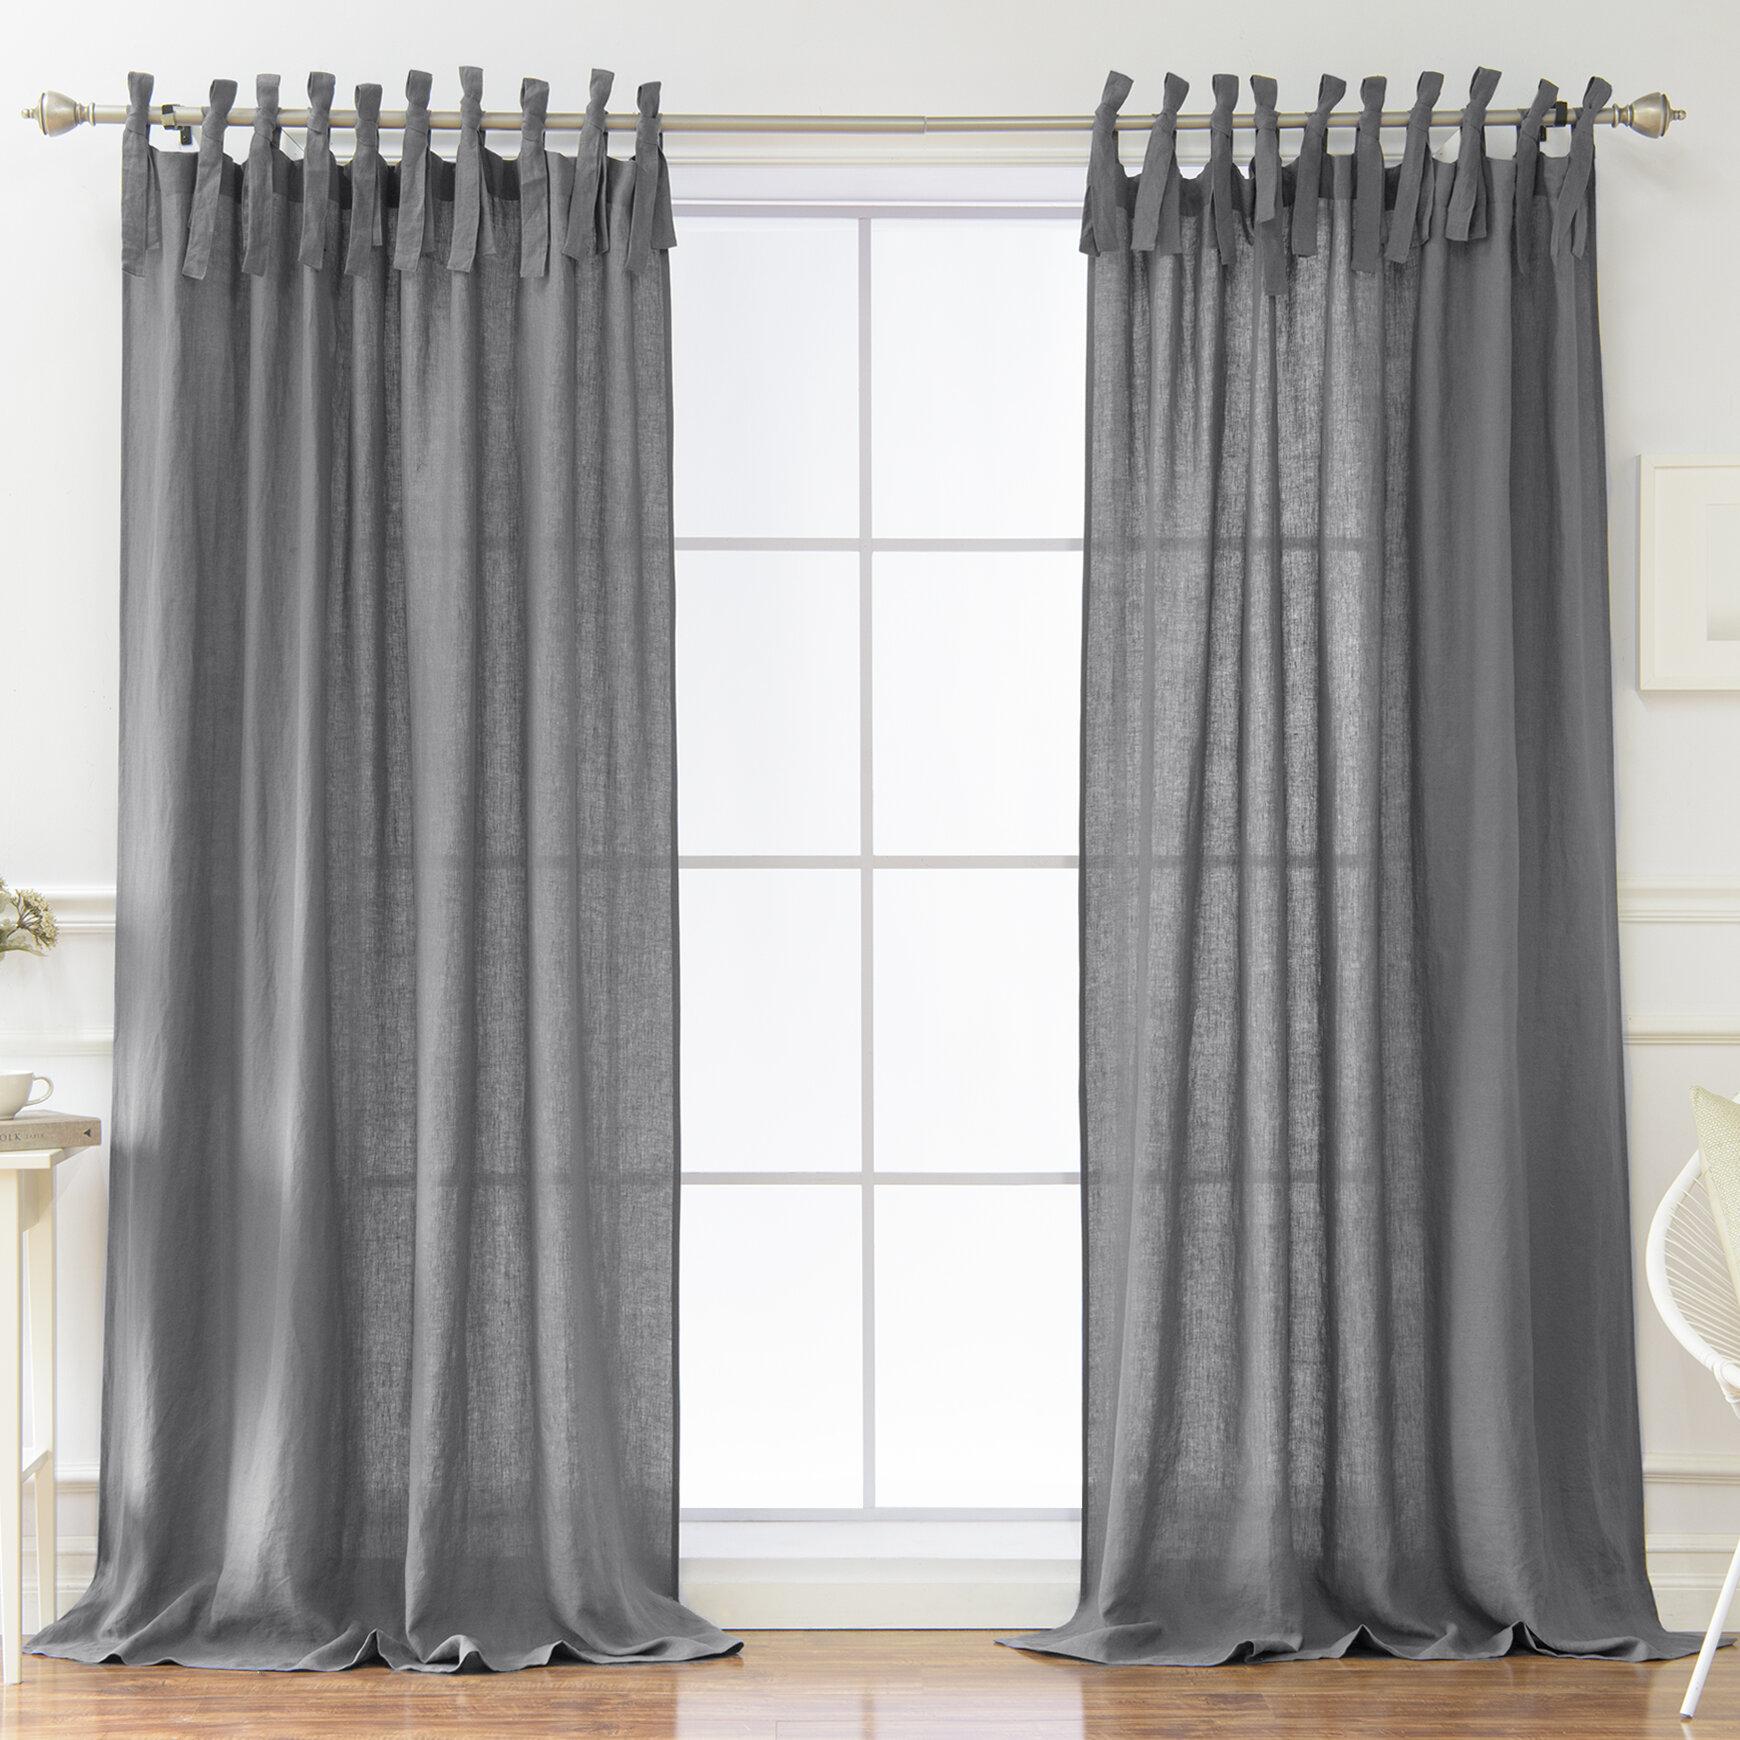 Dungannon Solid Semi Sheer Tab Top Single Curtain Panel In Tab Top Sheer Single Curtain Panels (View 26 of 30)